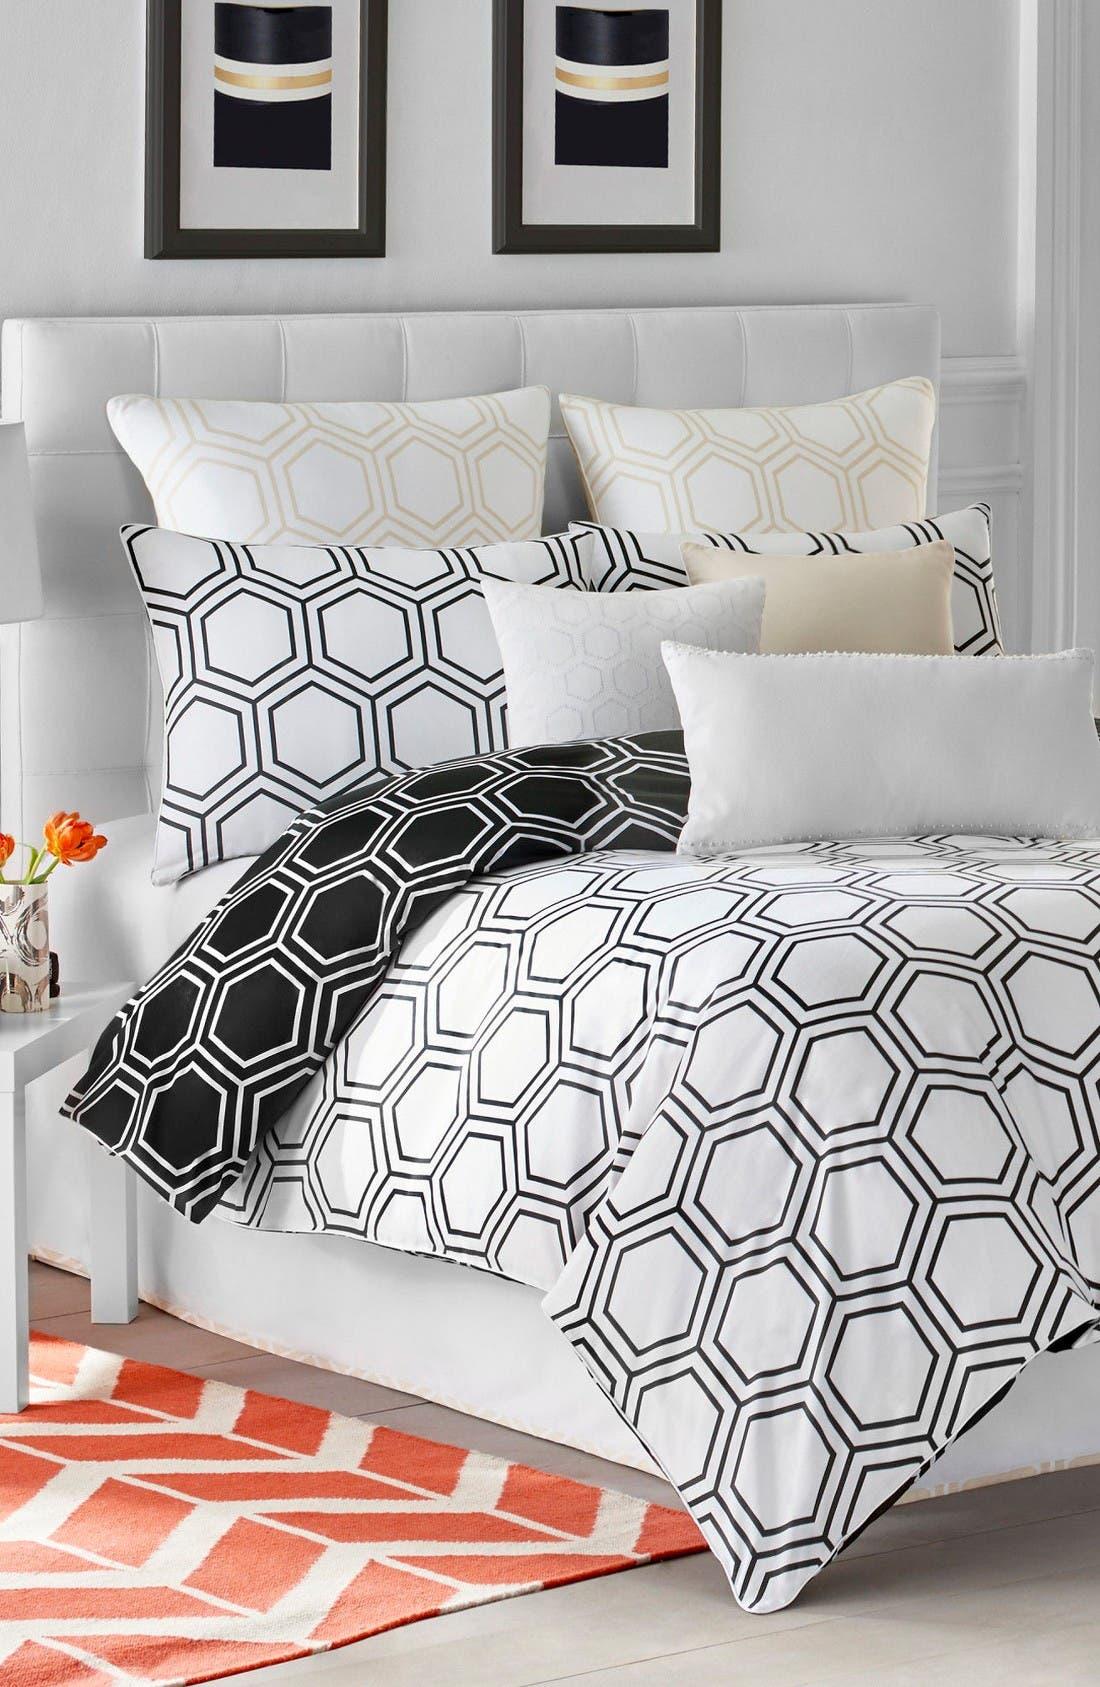 Jill Rosenwald Blackpoint Hex Comforter